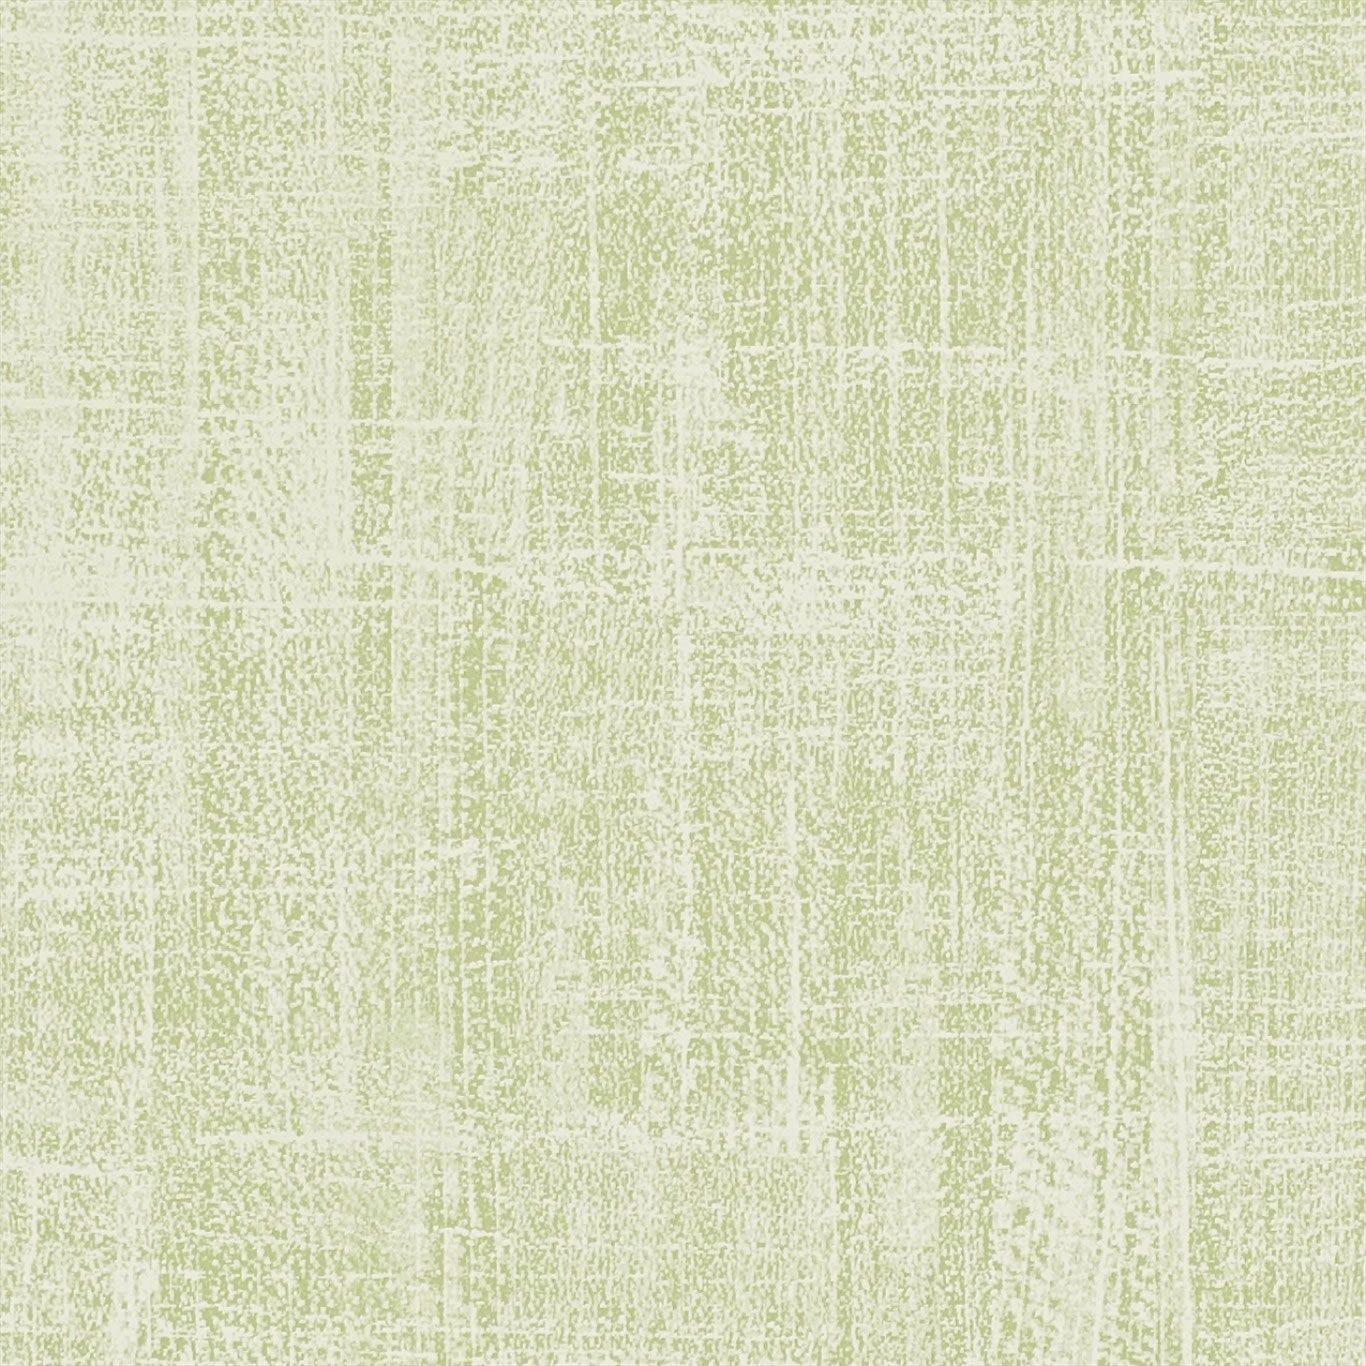 Olive Green Desktop Wallpaper 1366x1366